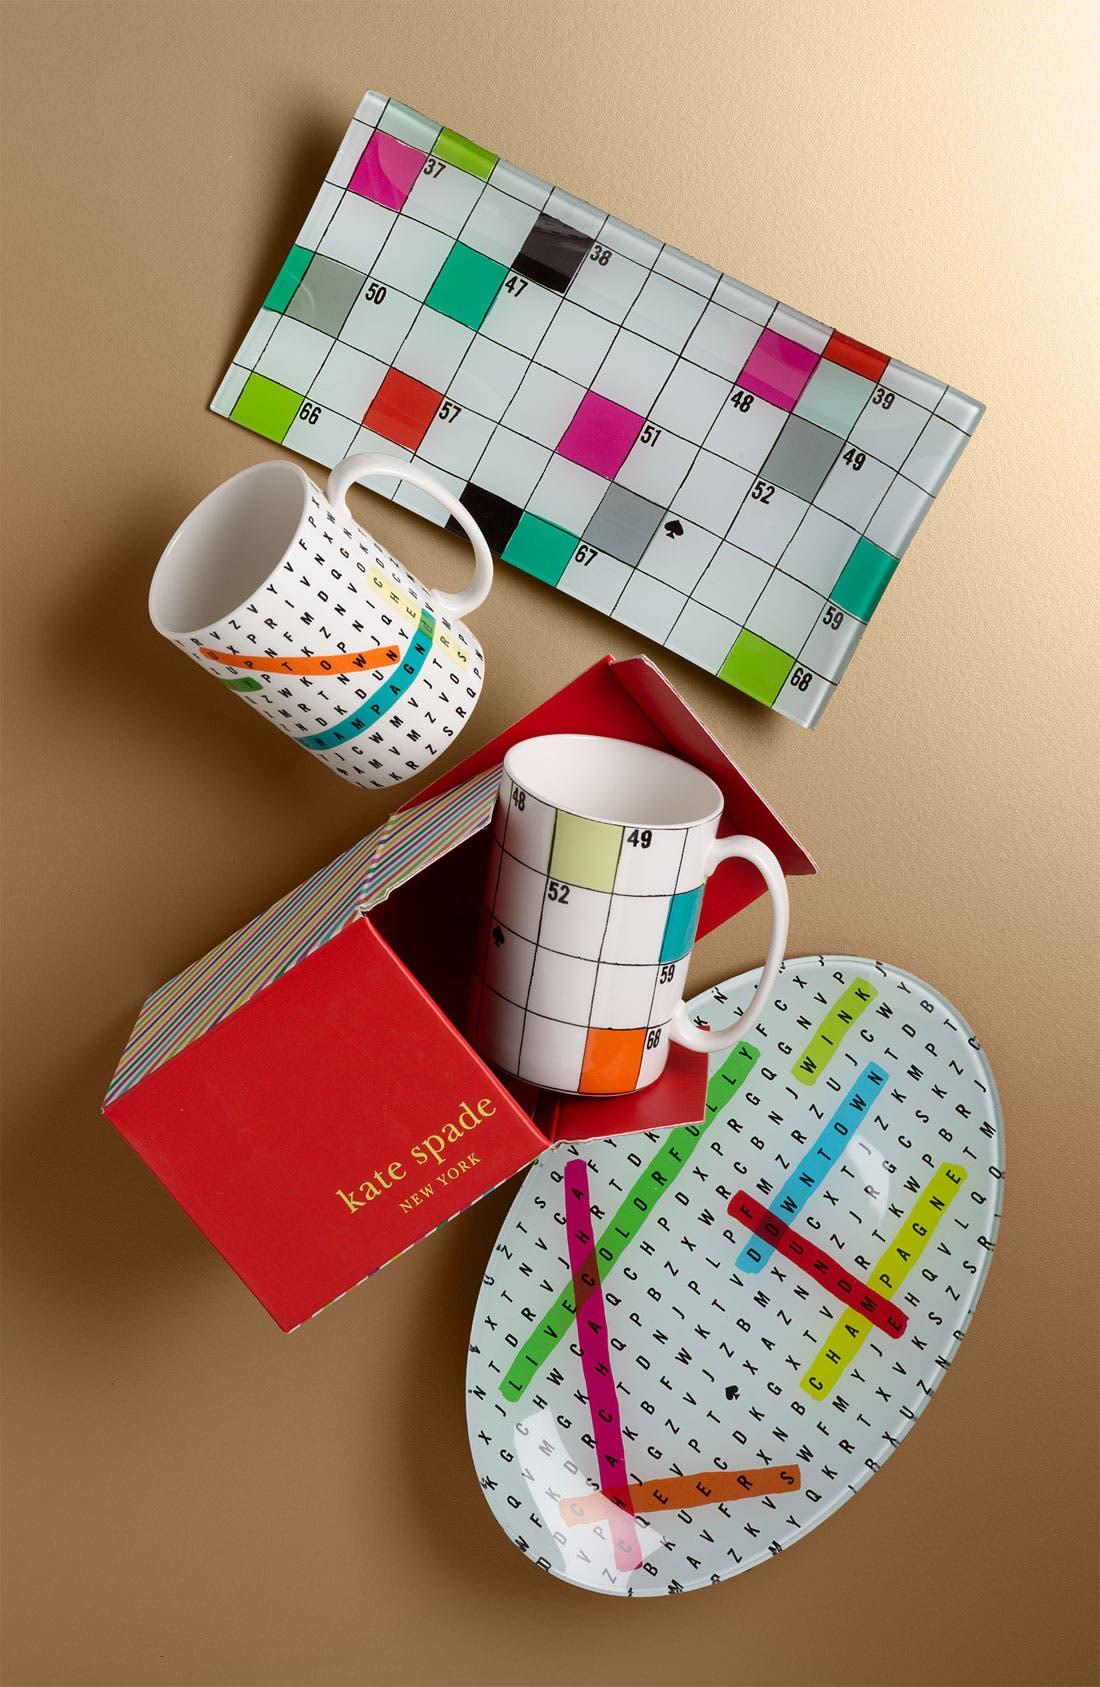 Alternate Image 2  - kate spade new york 'say the word' crossword mug